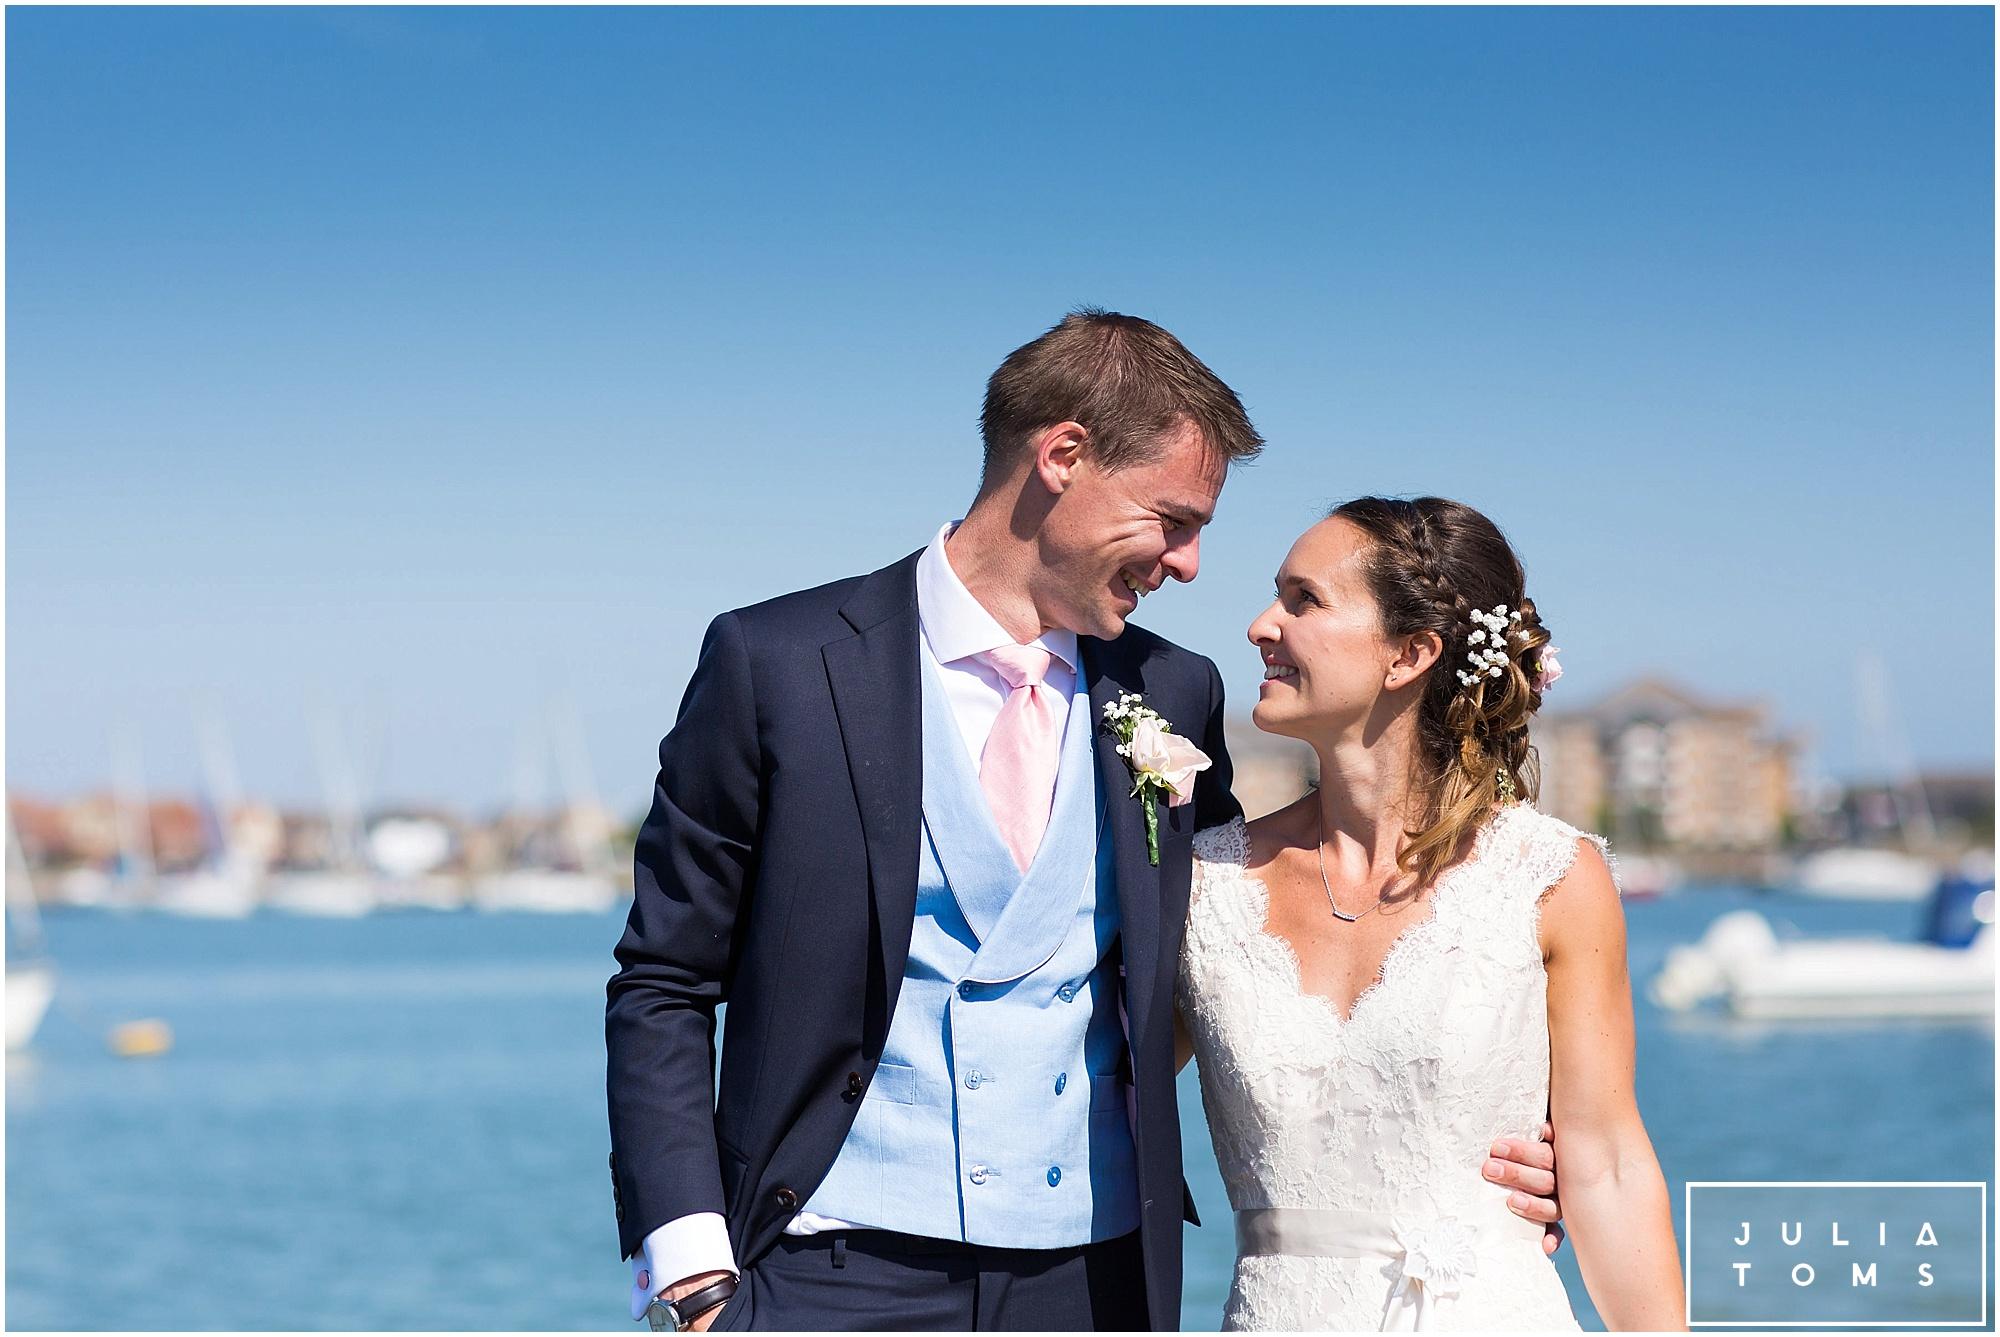 julia_toms_chichester_wedding_photographer_portsmouth_039.jpg